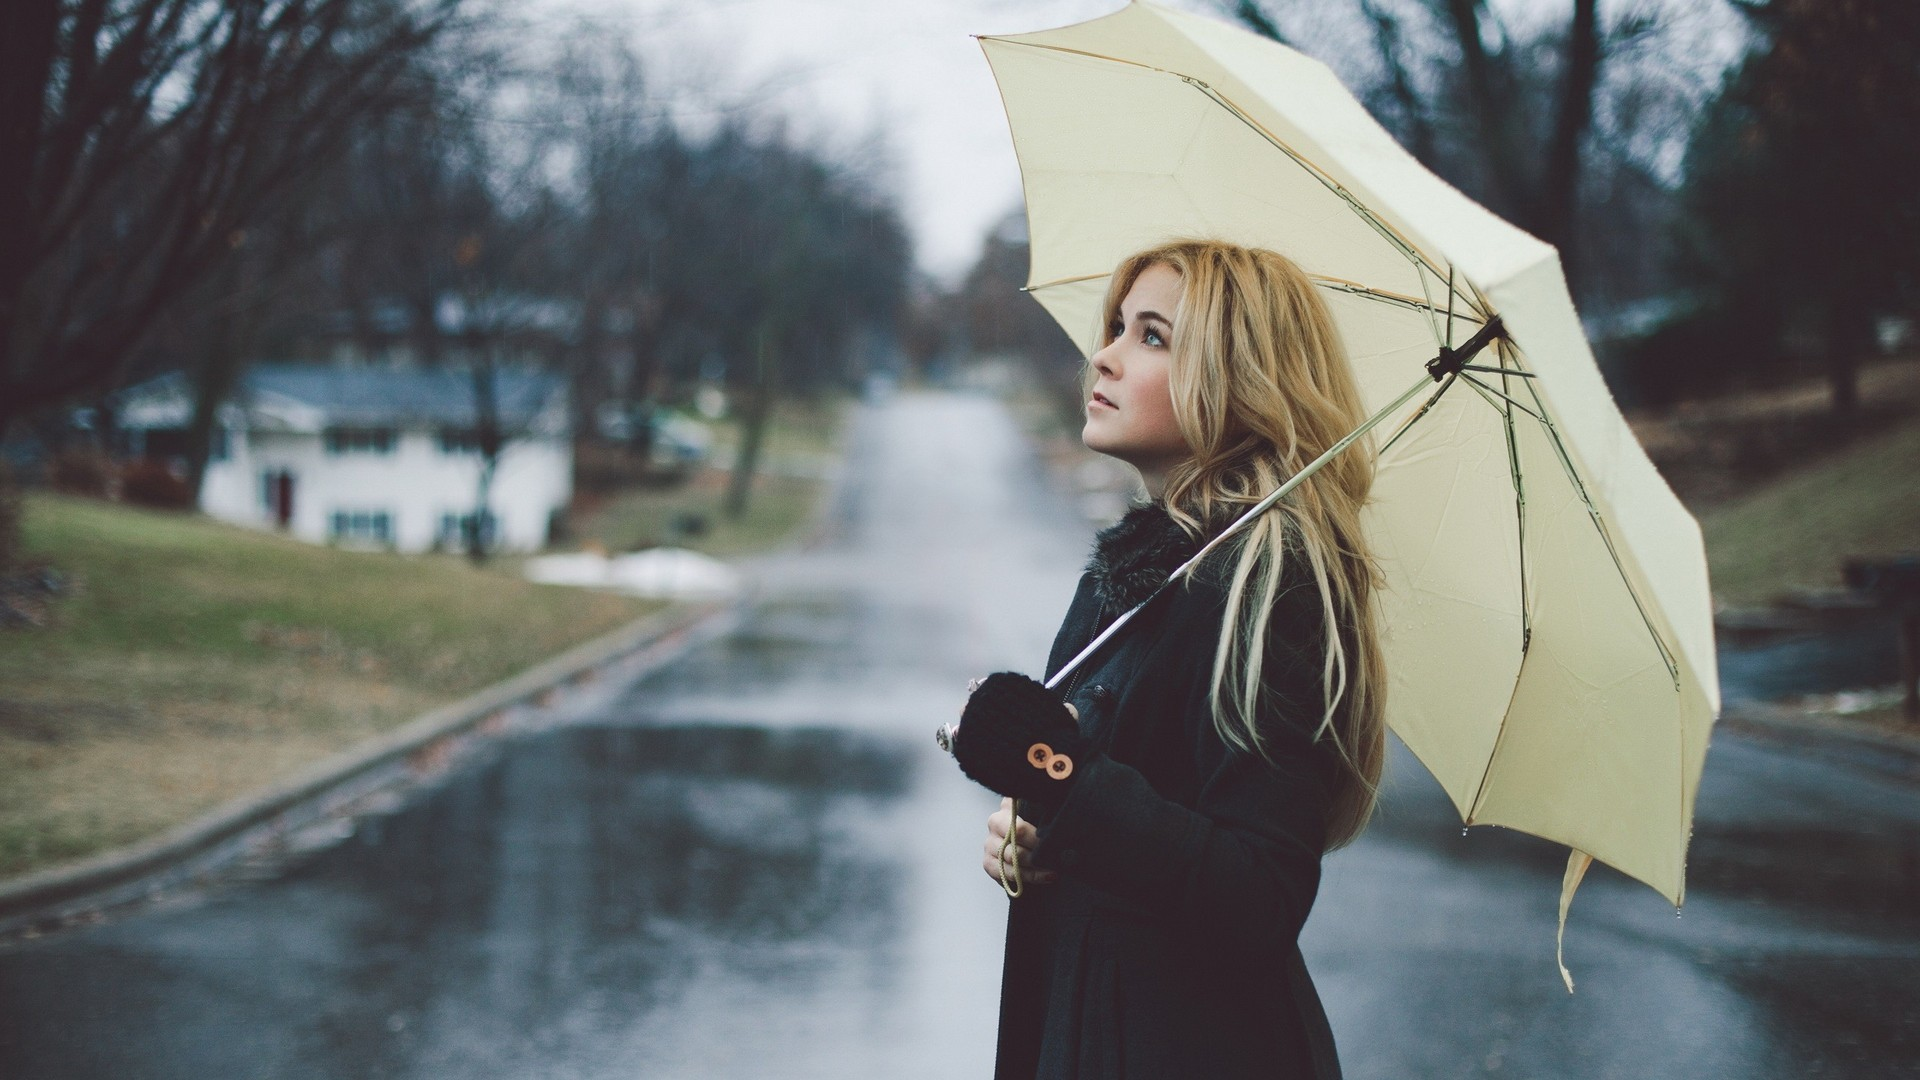 Картинка девушка одна под зонтом